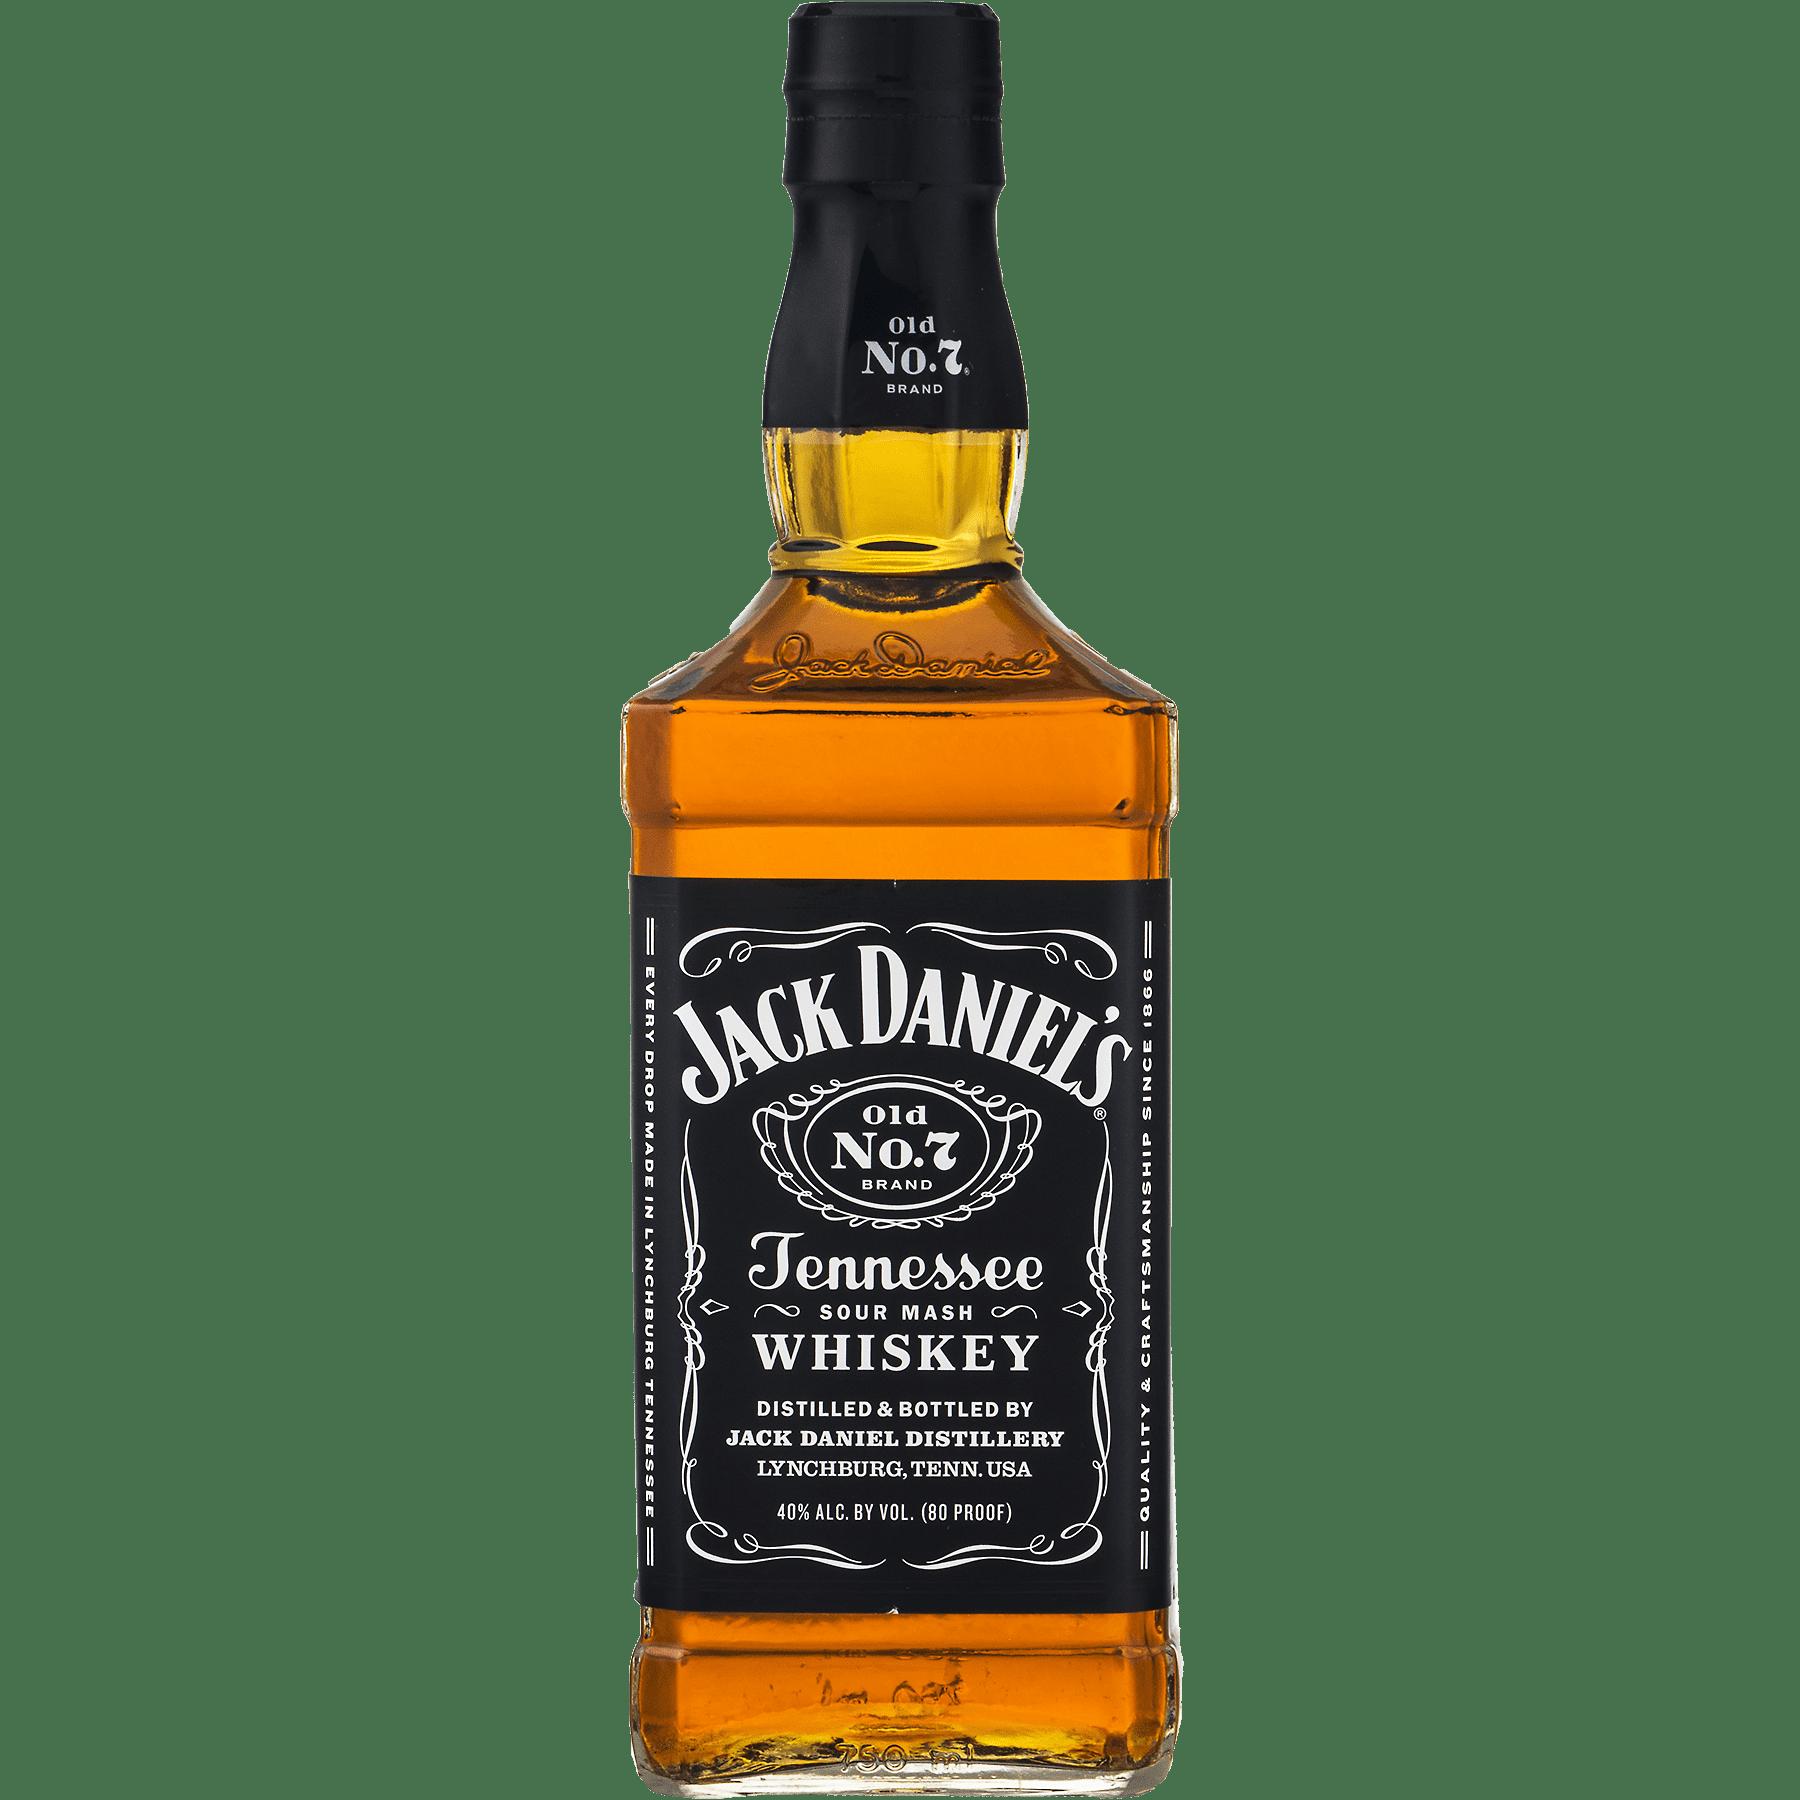 jack-daniels-bottle-png-2 - Mai Tai Yacht Charters